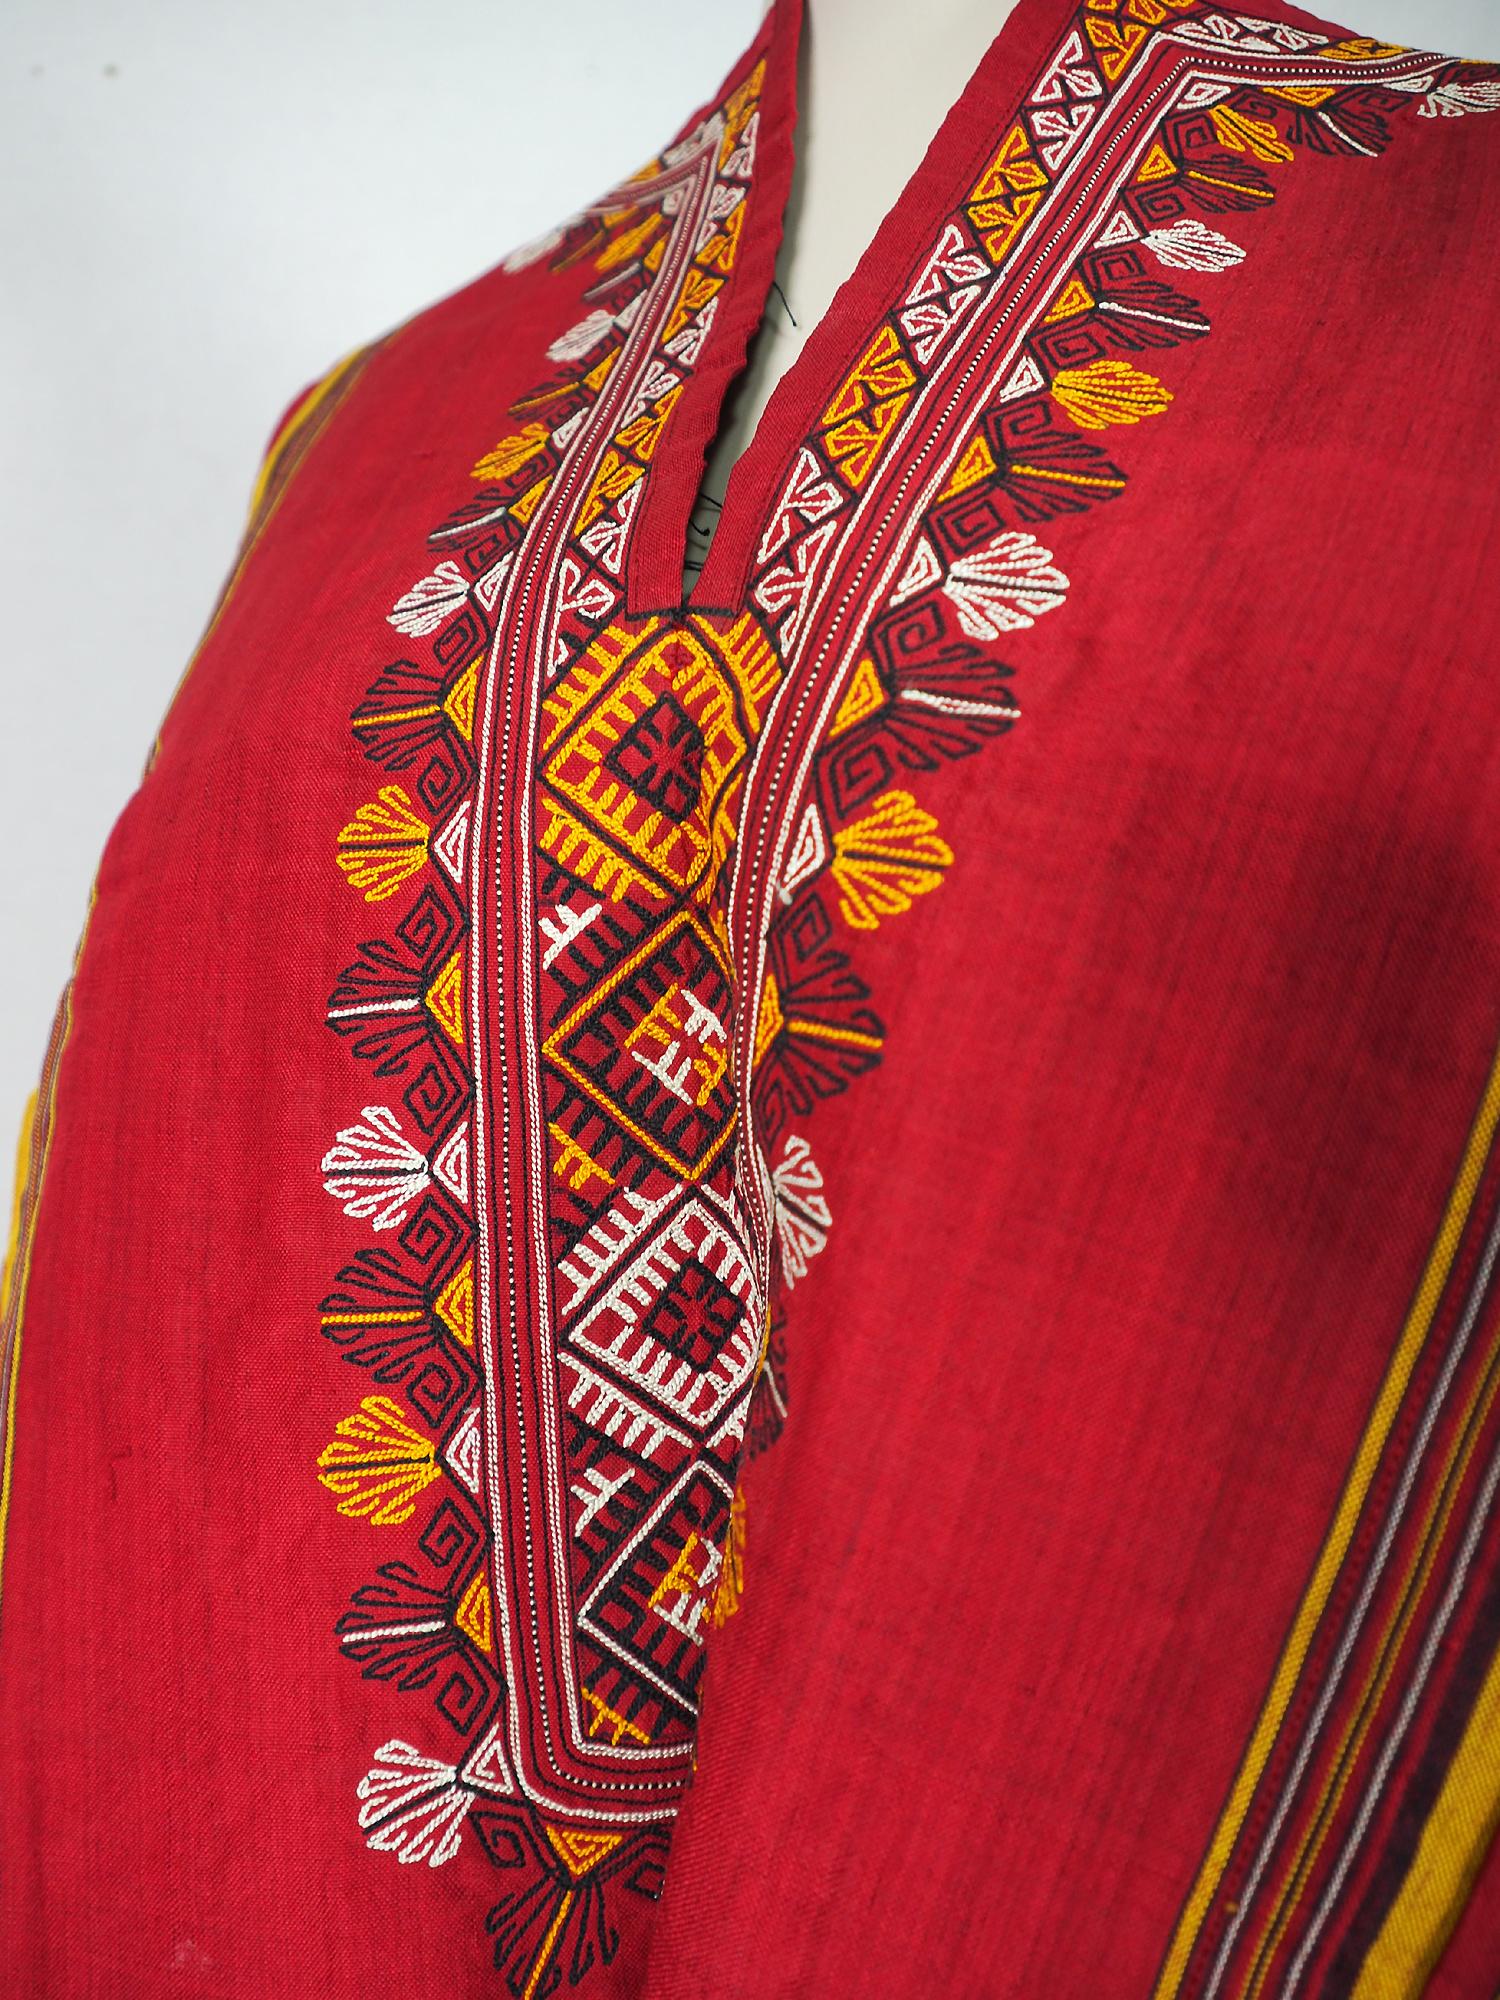 Antike Seiden Kleid aus Usbekistan No:21/11